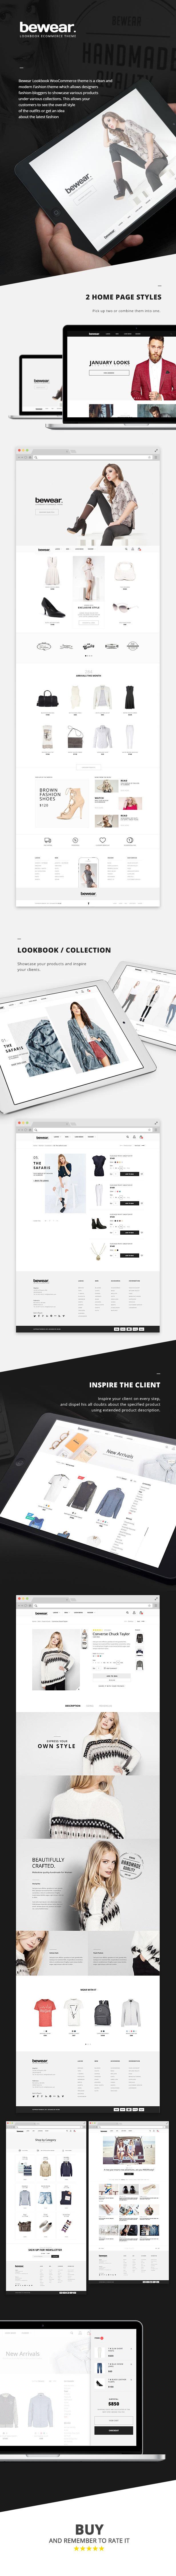 Bewear - Fashion LookBook WooCommerce Theme - 1